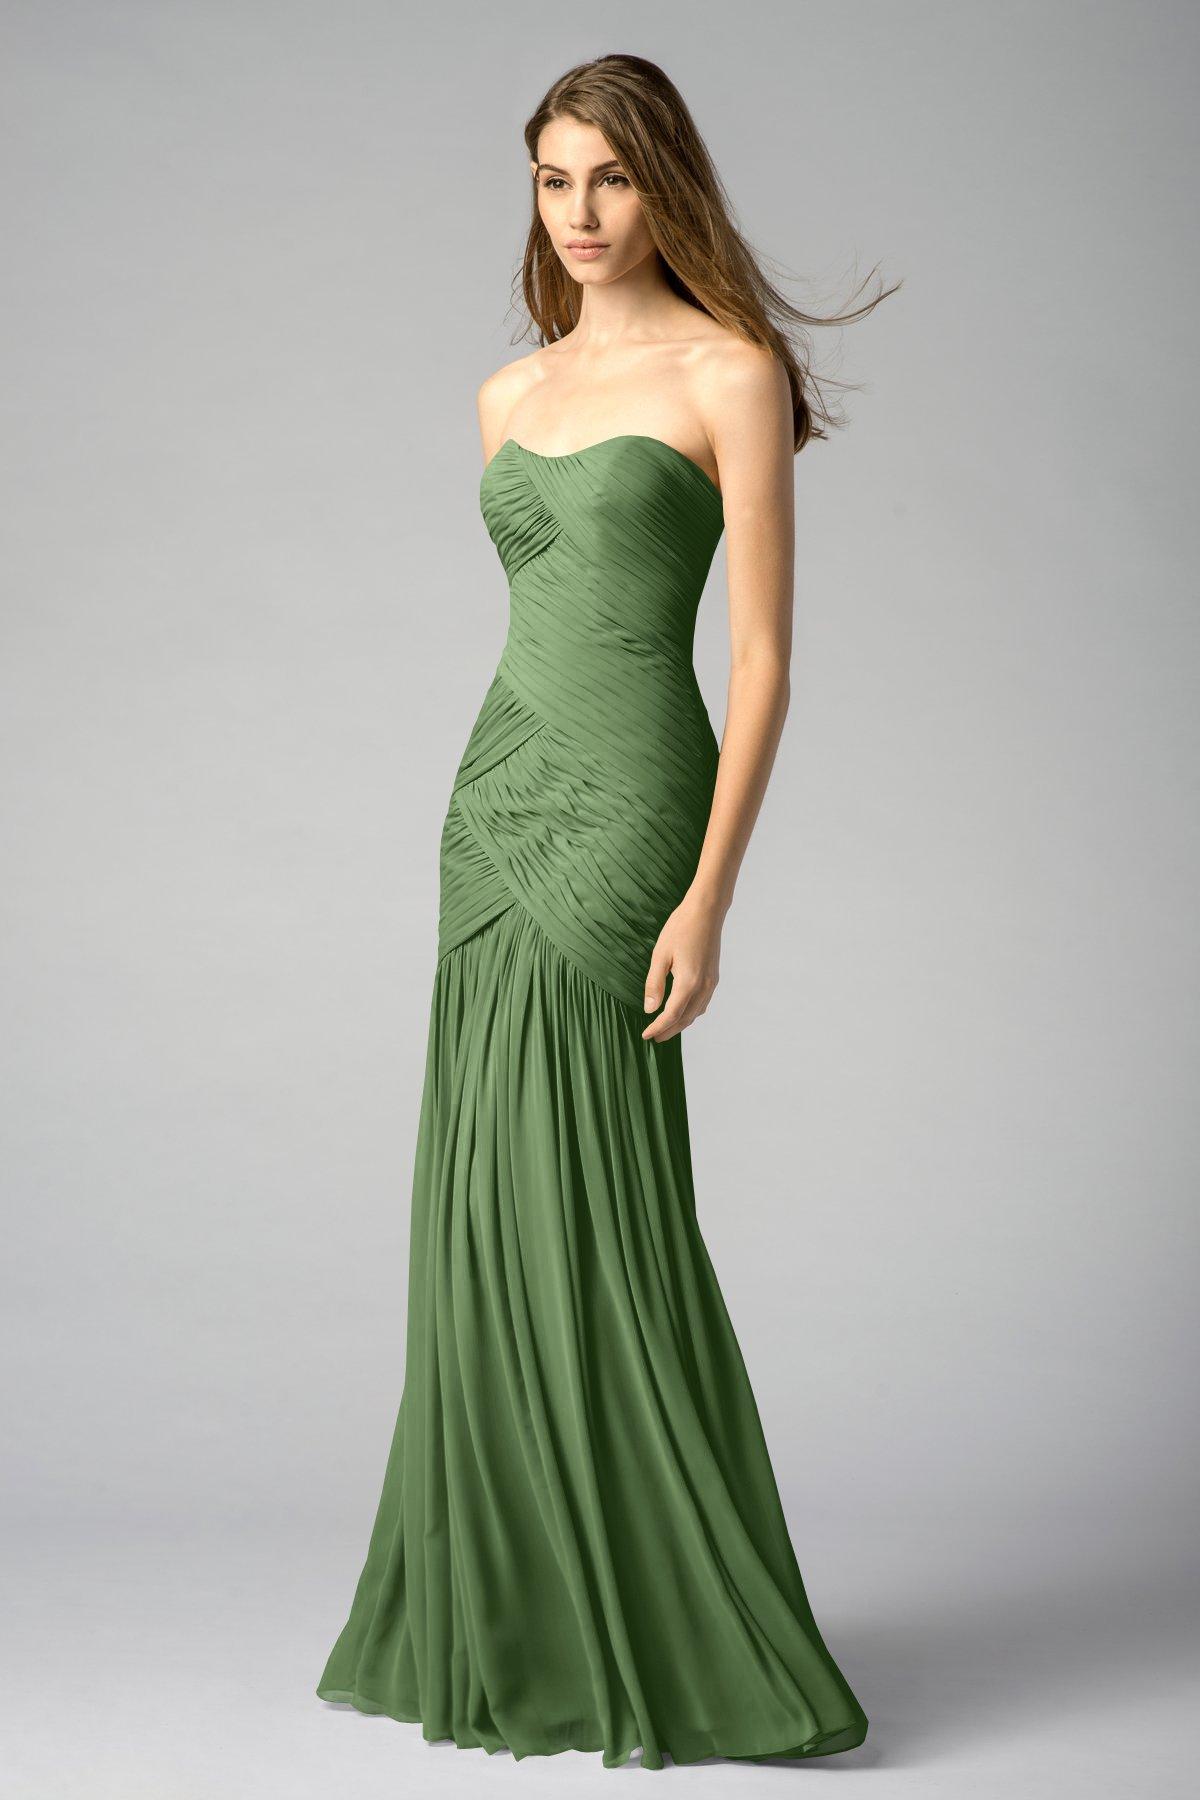 Flora Green Mermaid Bridesmaid Gowns 2017